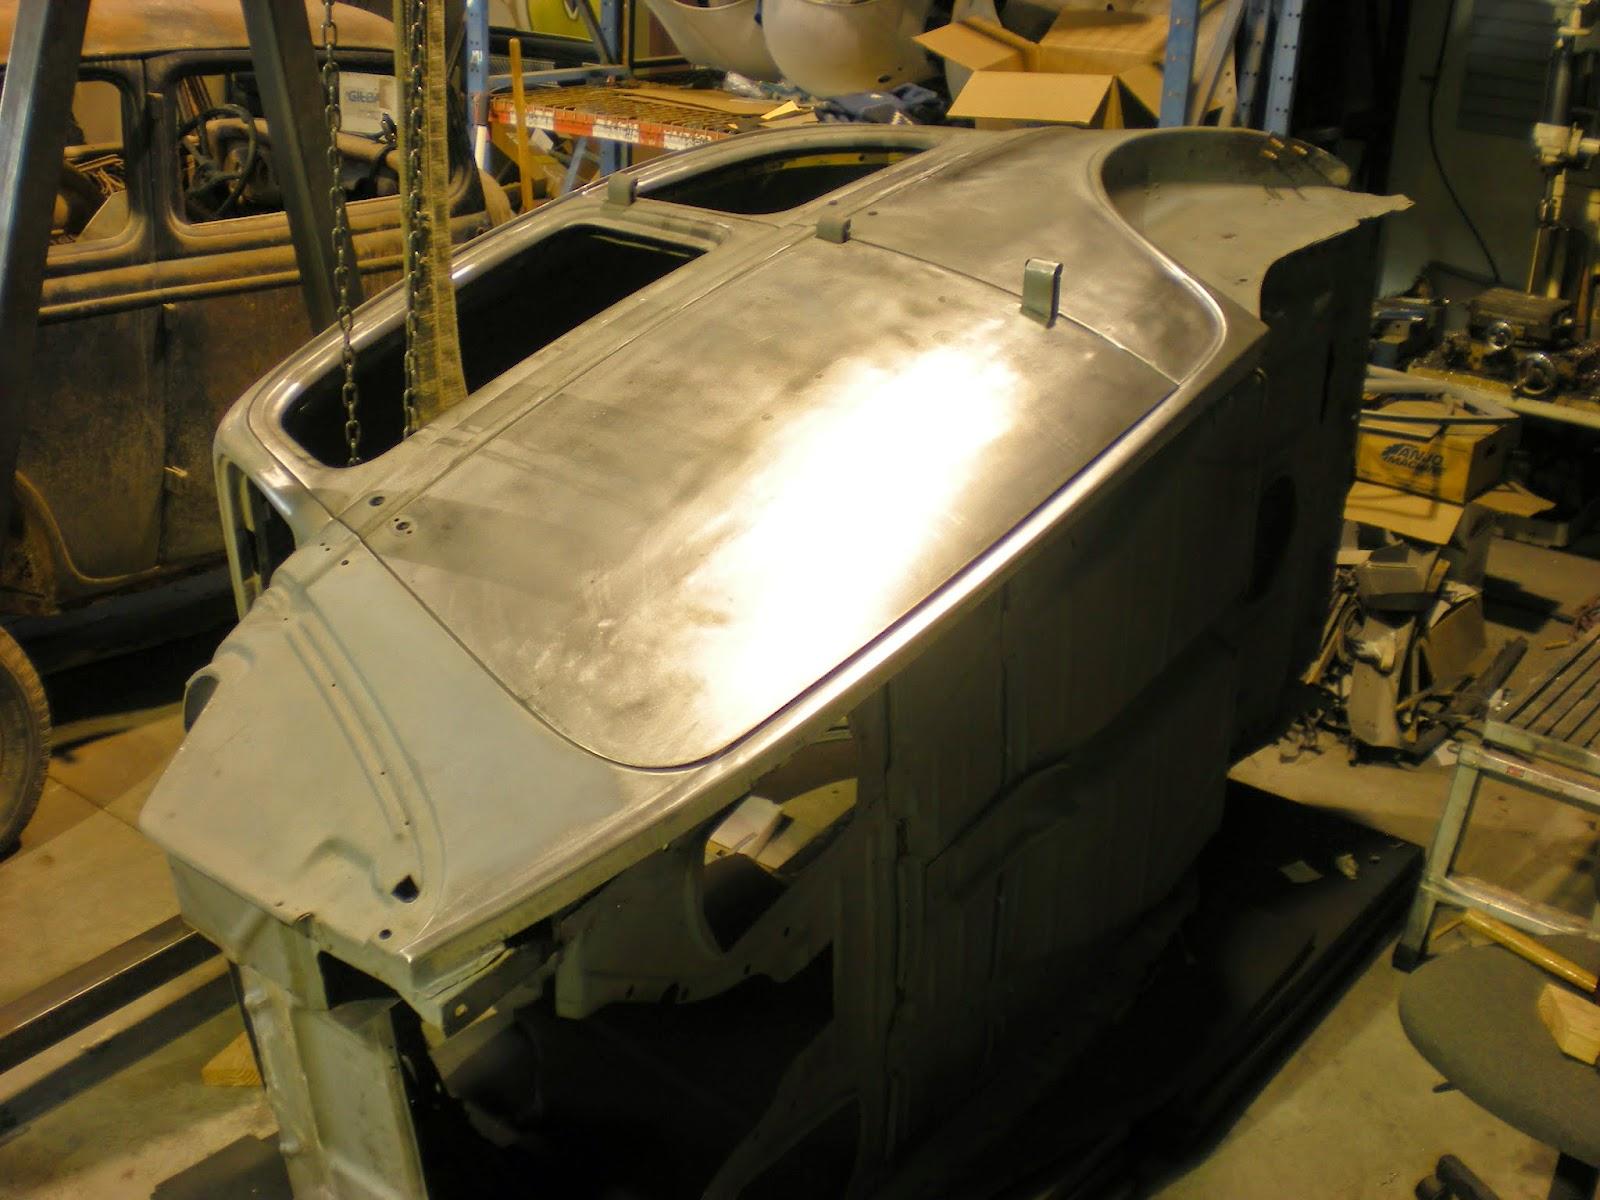 Salt Flats Speed Shop: Finished installing the new rocker